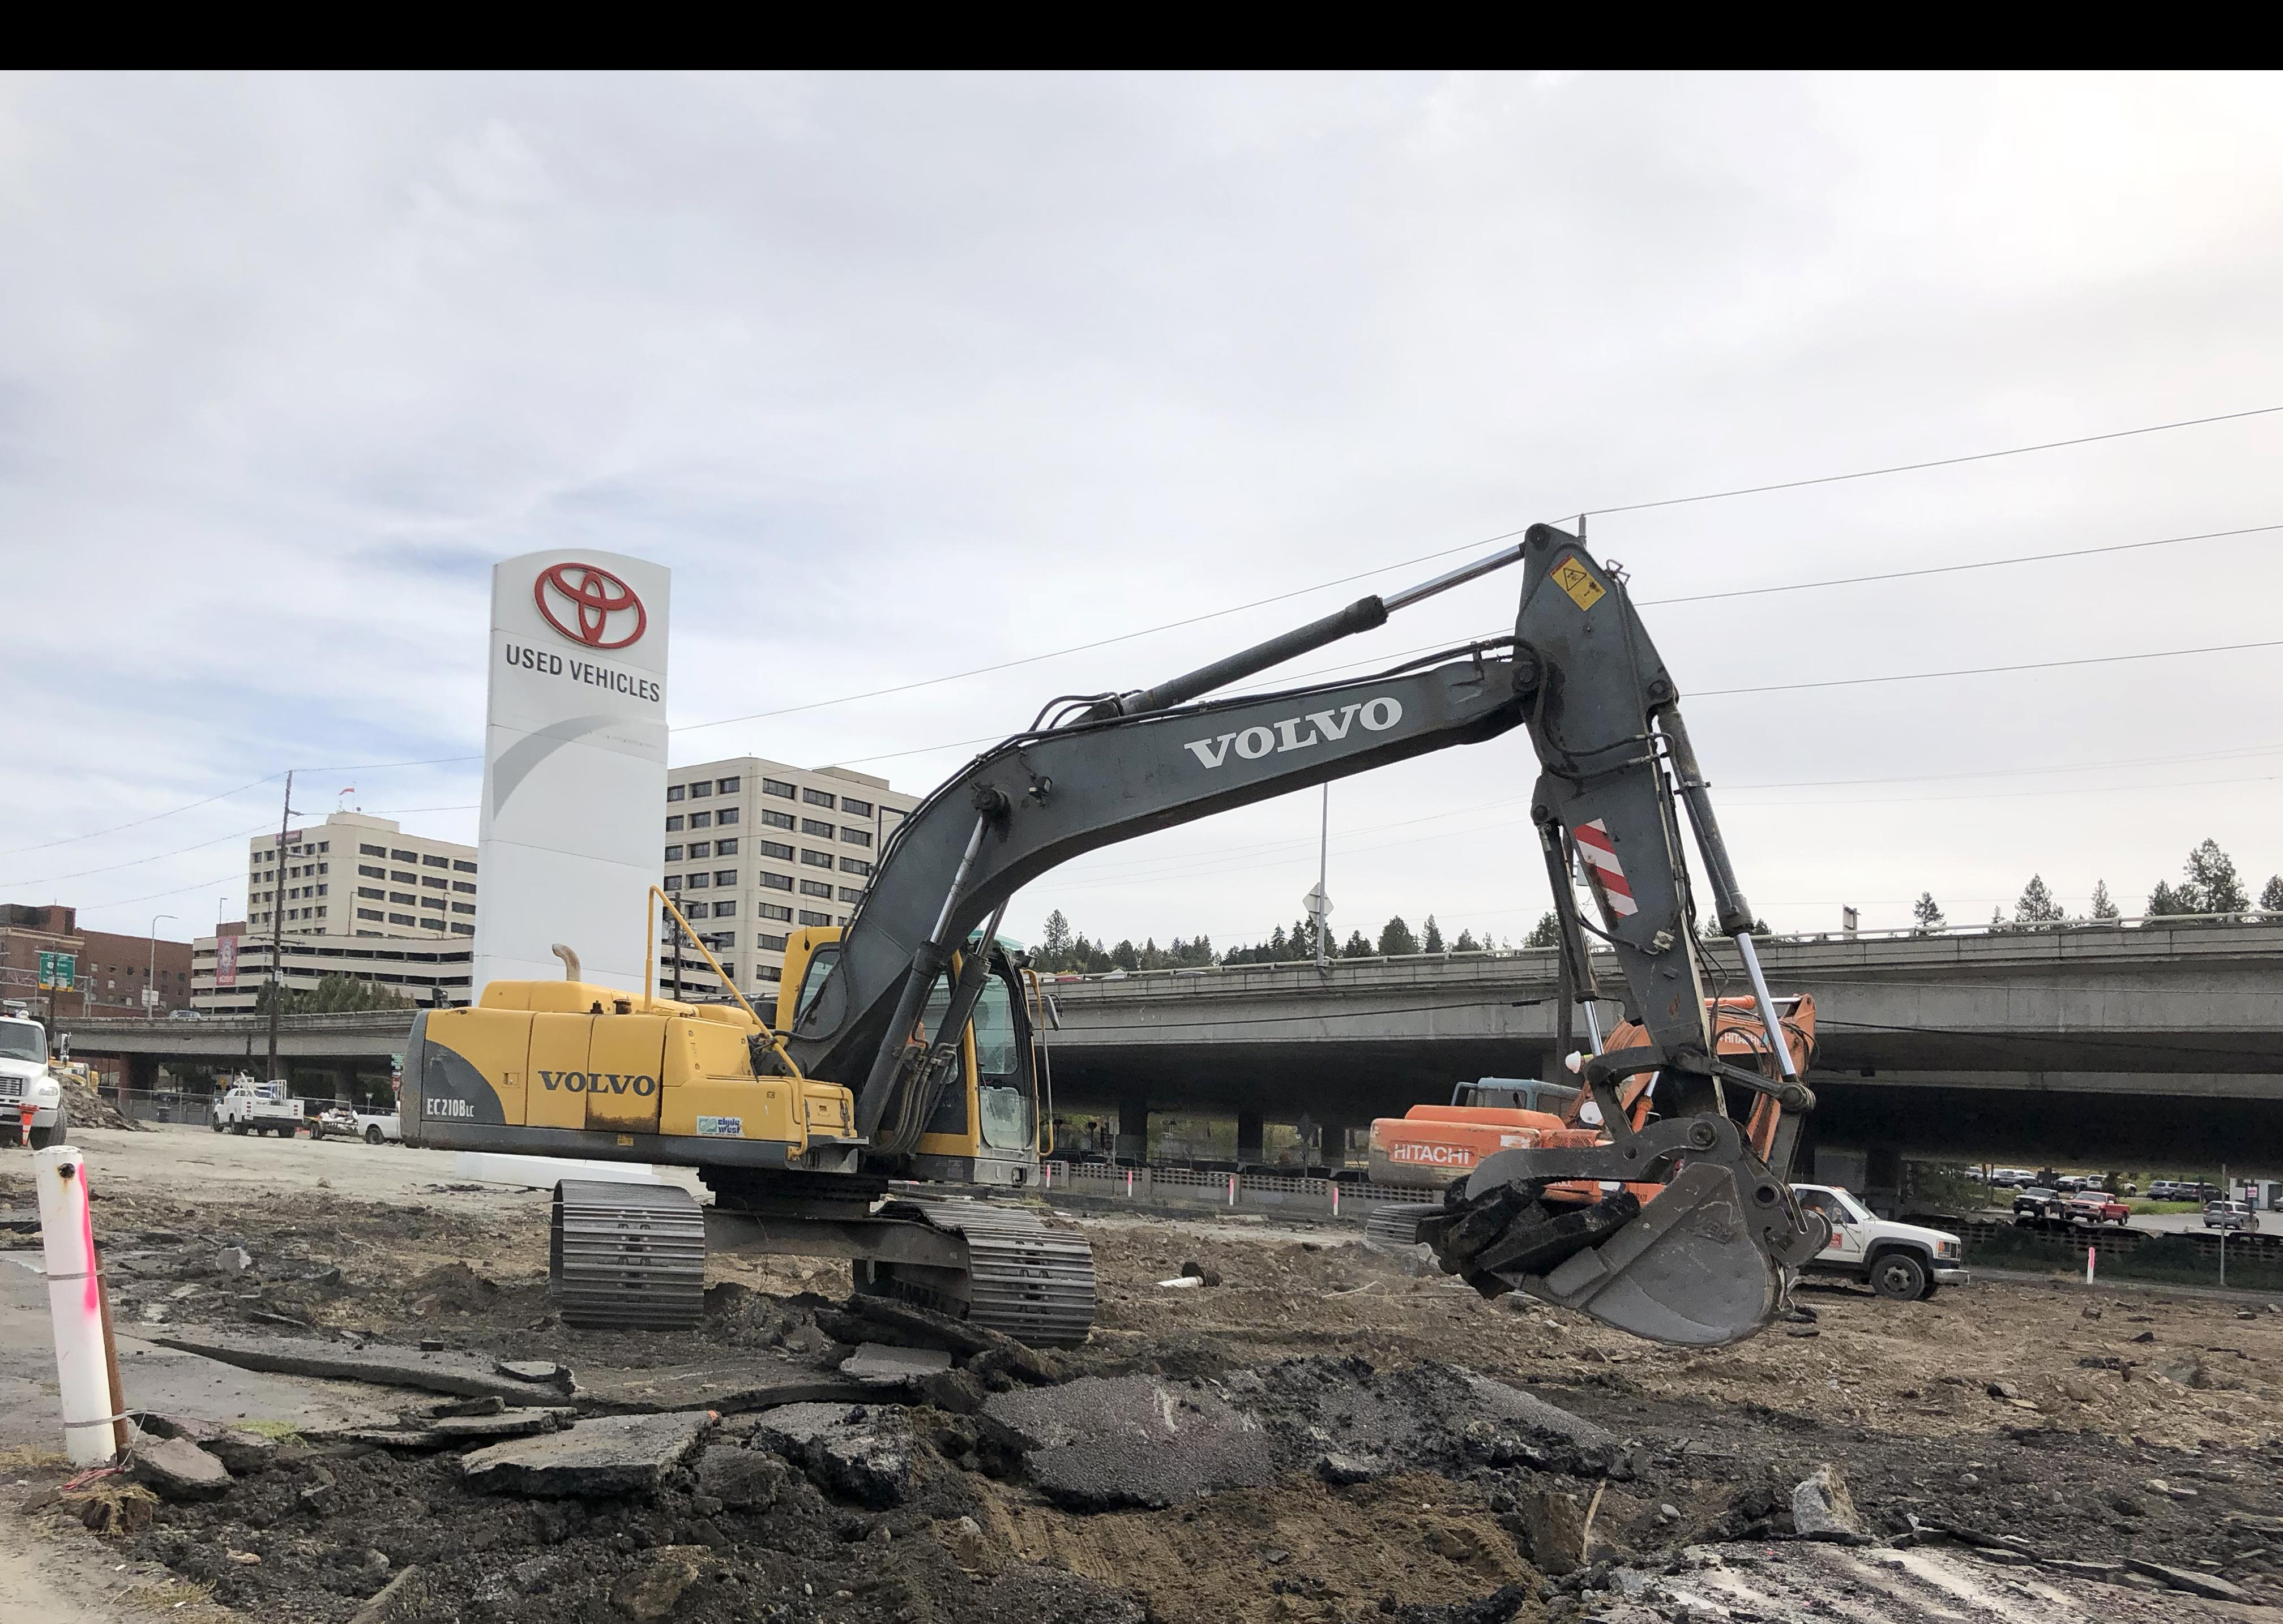 Larry H Miller Toyota Spokane >> Buildings Demolition Clears Way For Larry H Miller